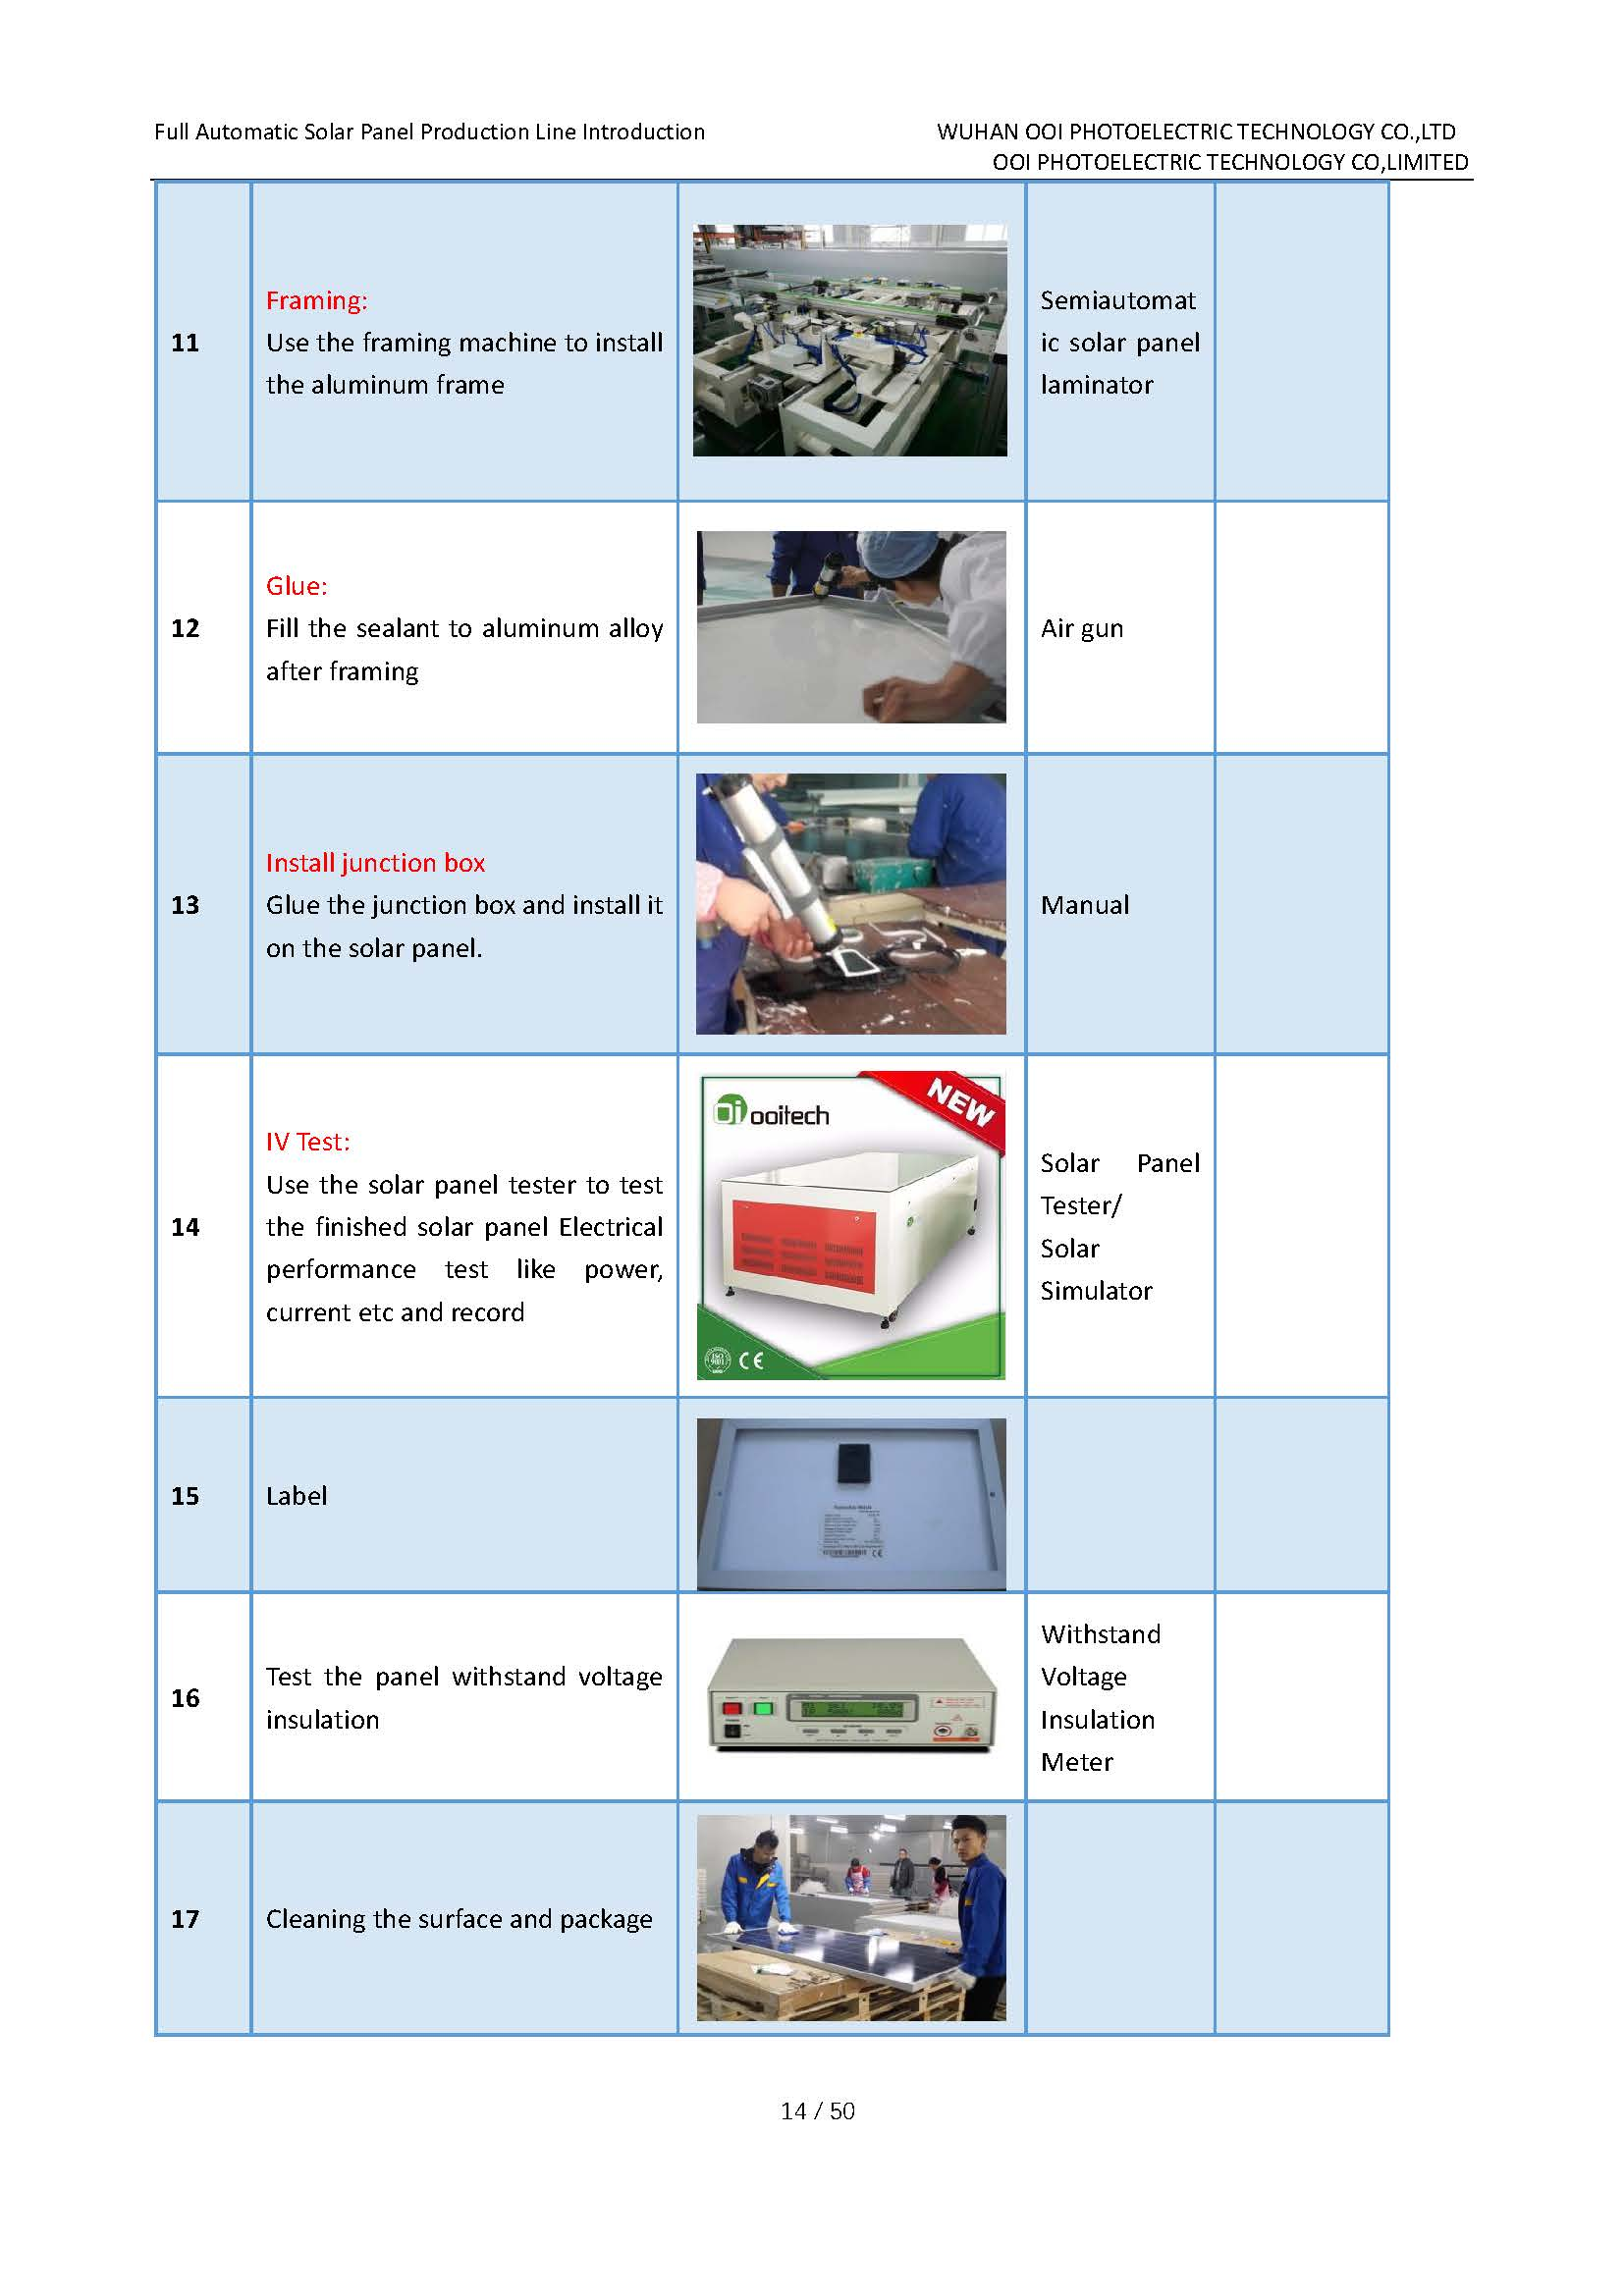 solar panel production line main machines